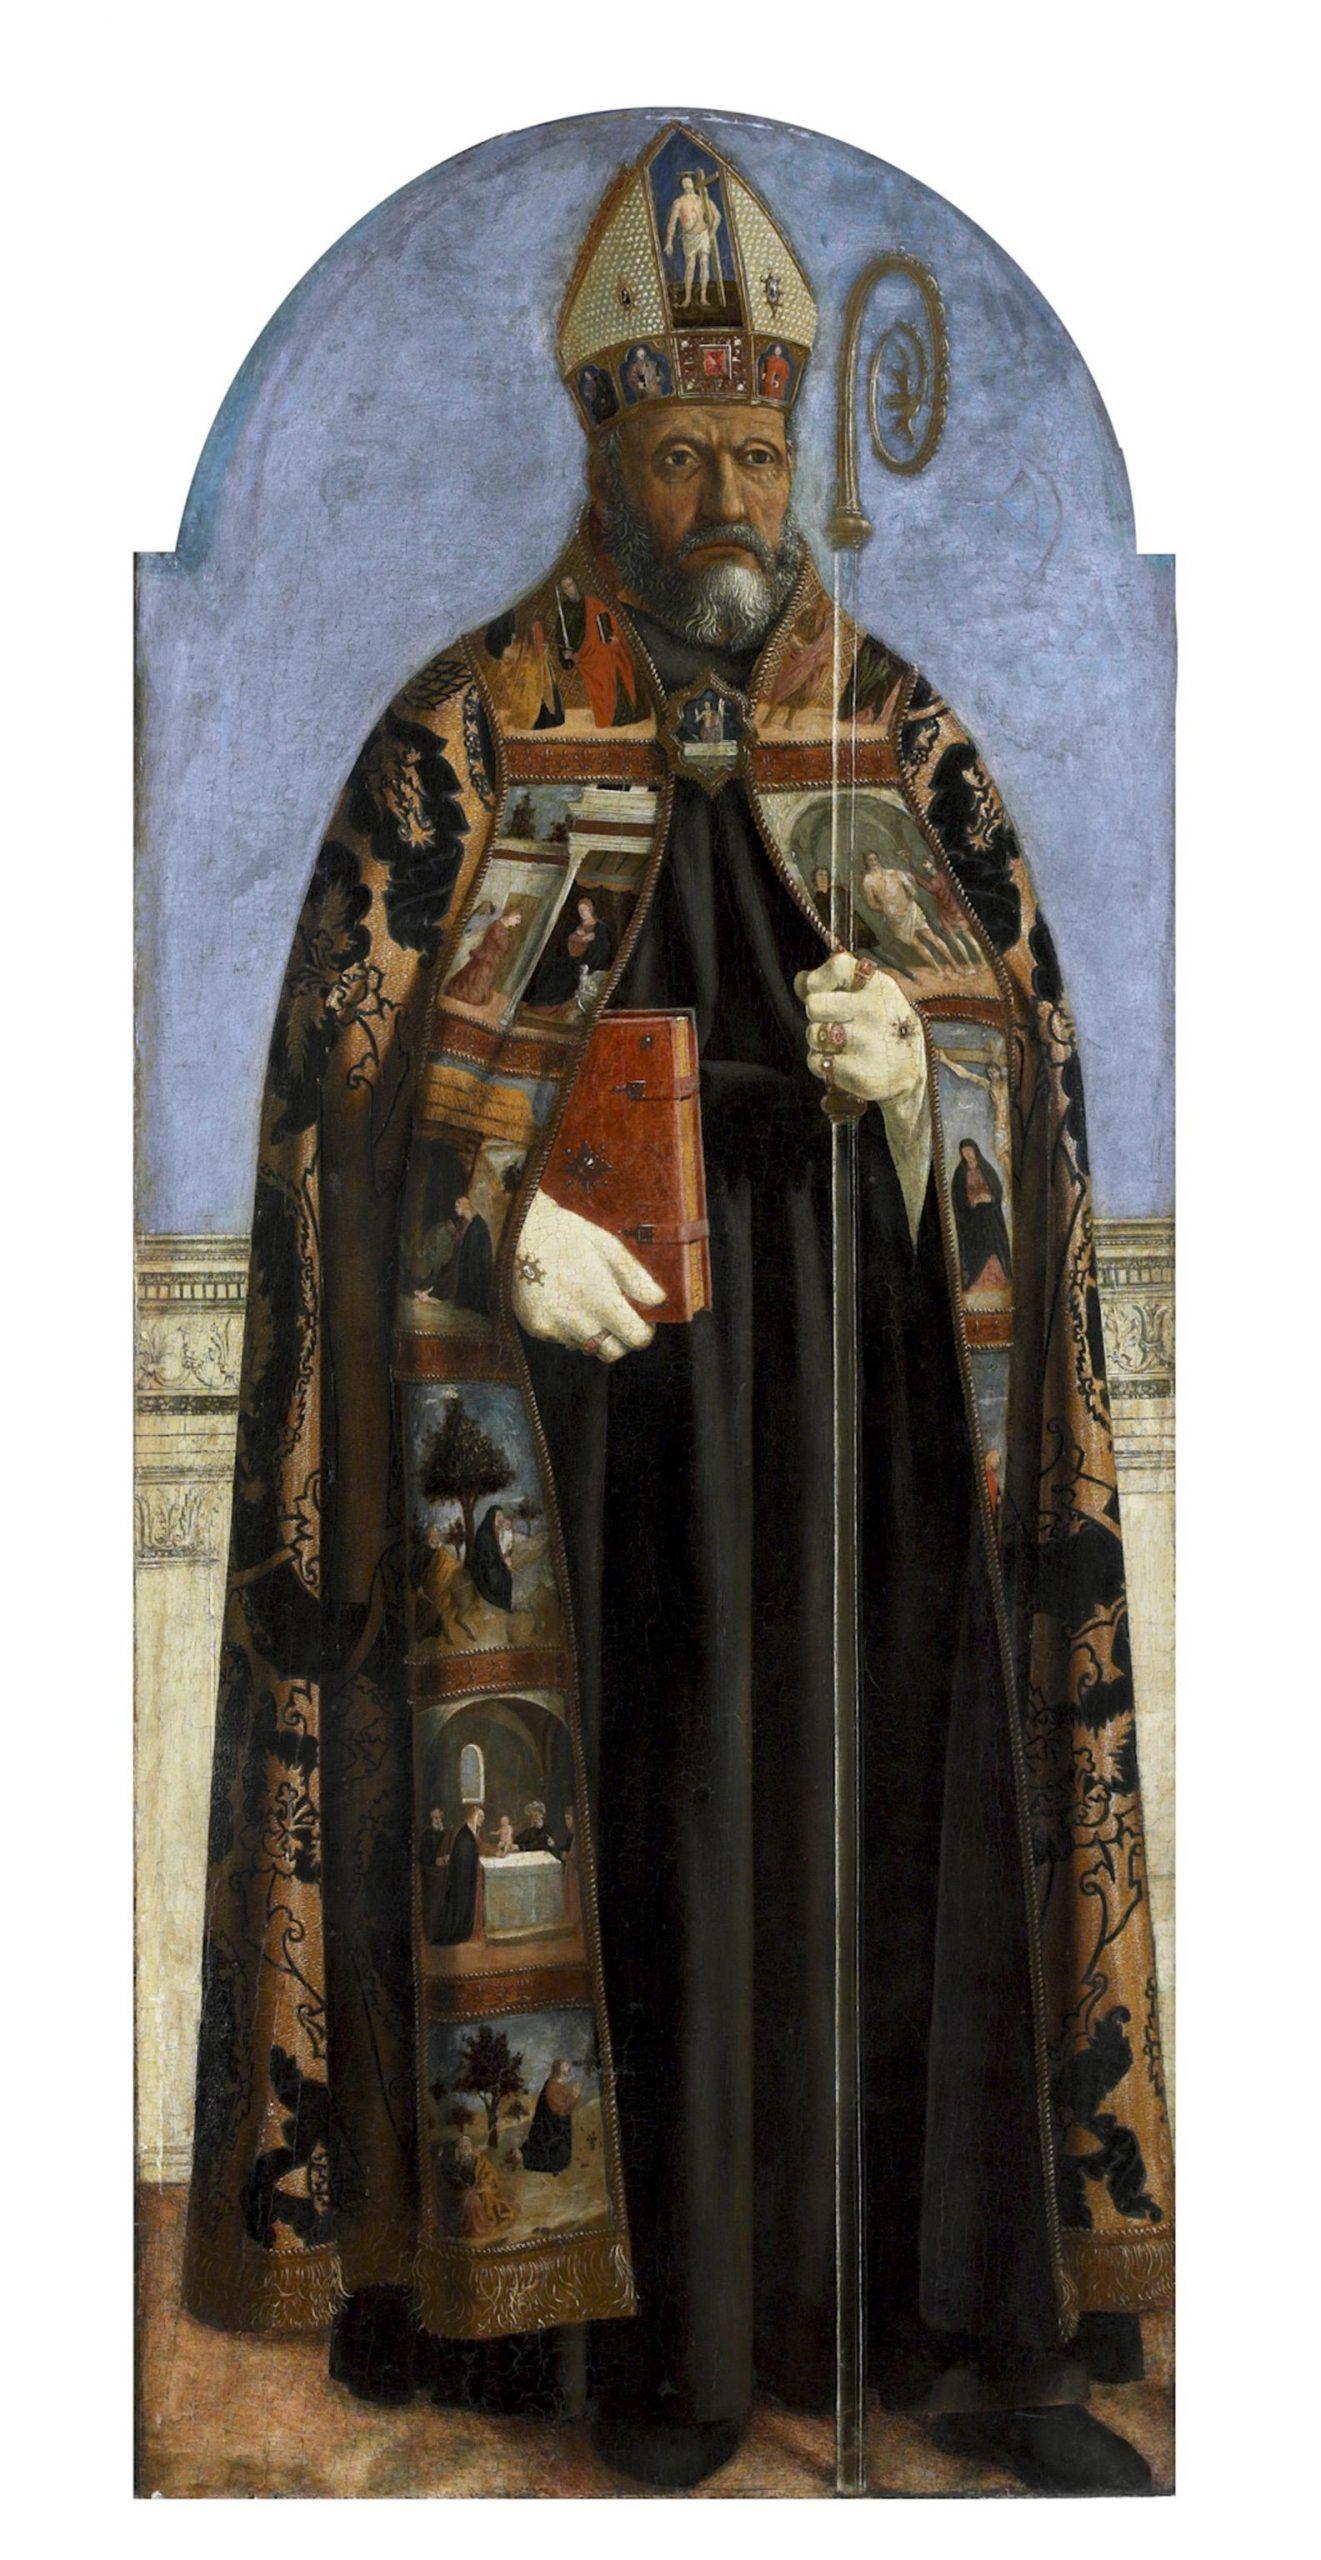 Sant'Agostino, le frasi più belle